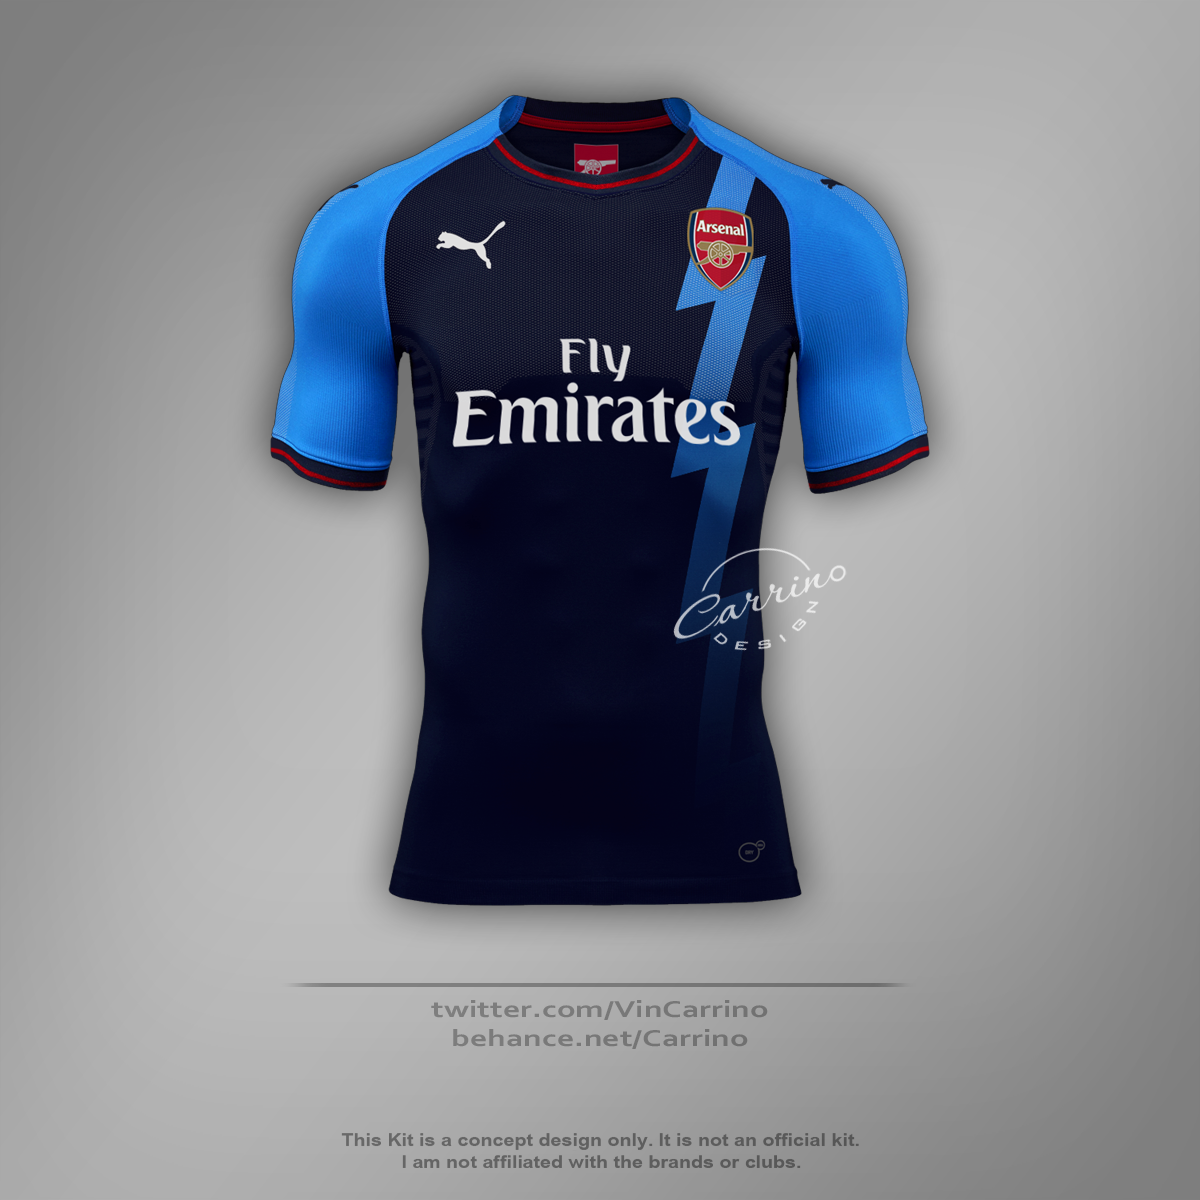 2fcd9c691ef Arsenal FC Third Jersey